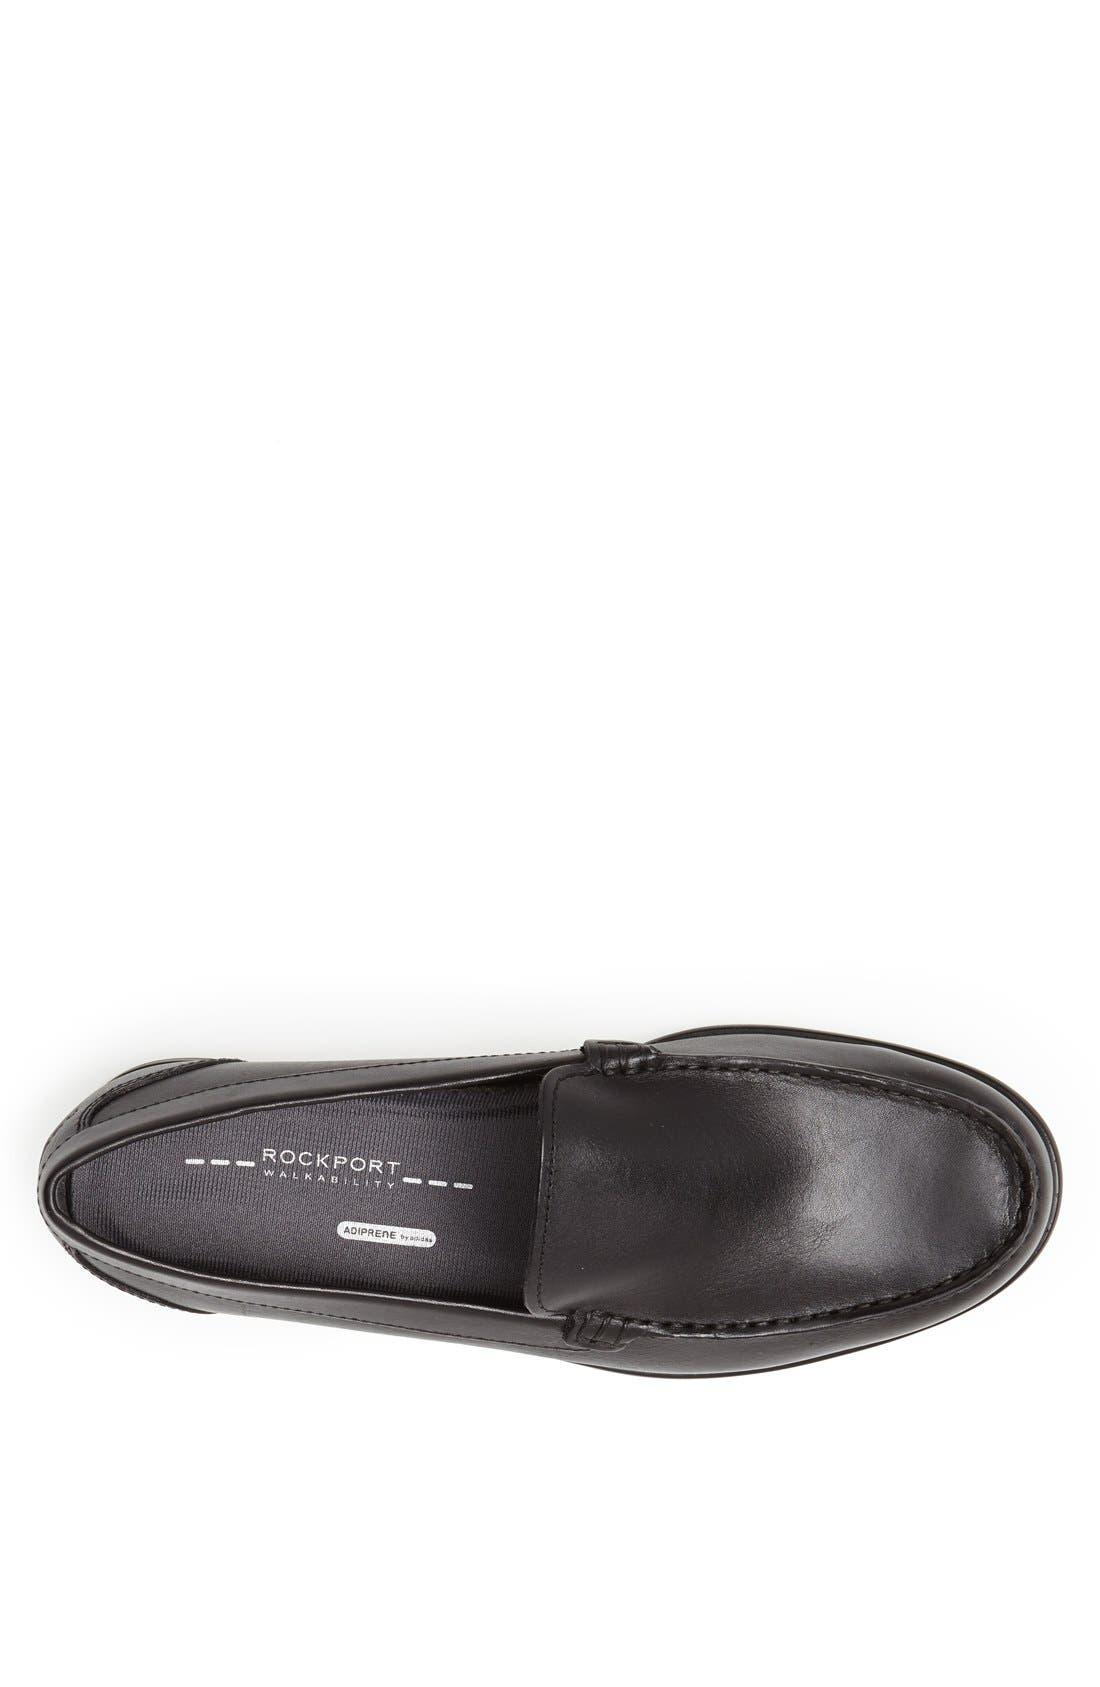 Alternate Image 3  - Rockport Classic Venetian Loafer (Men)